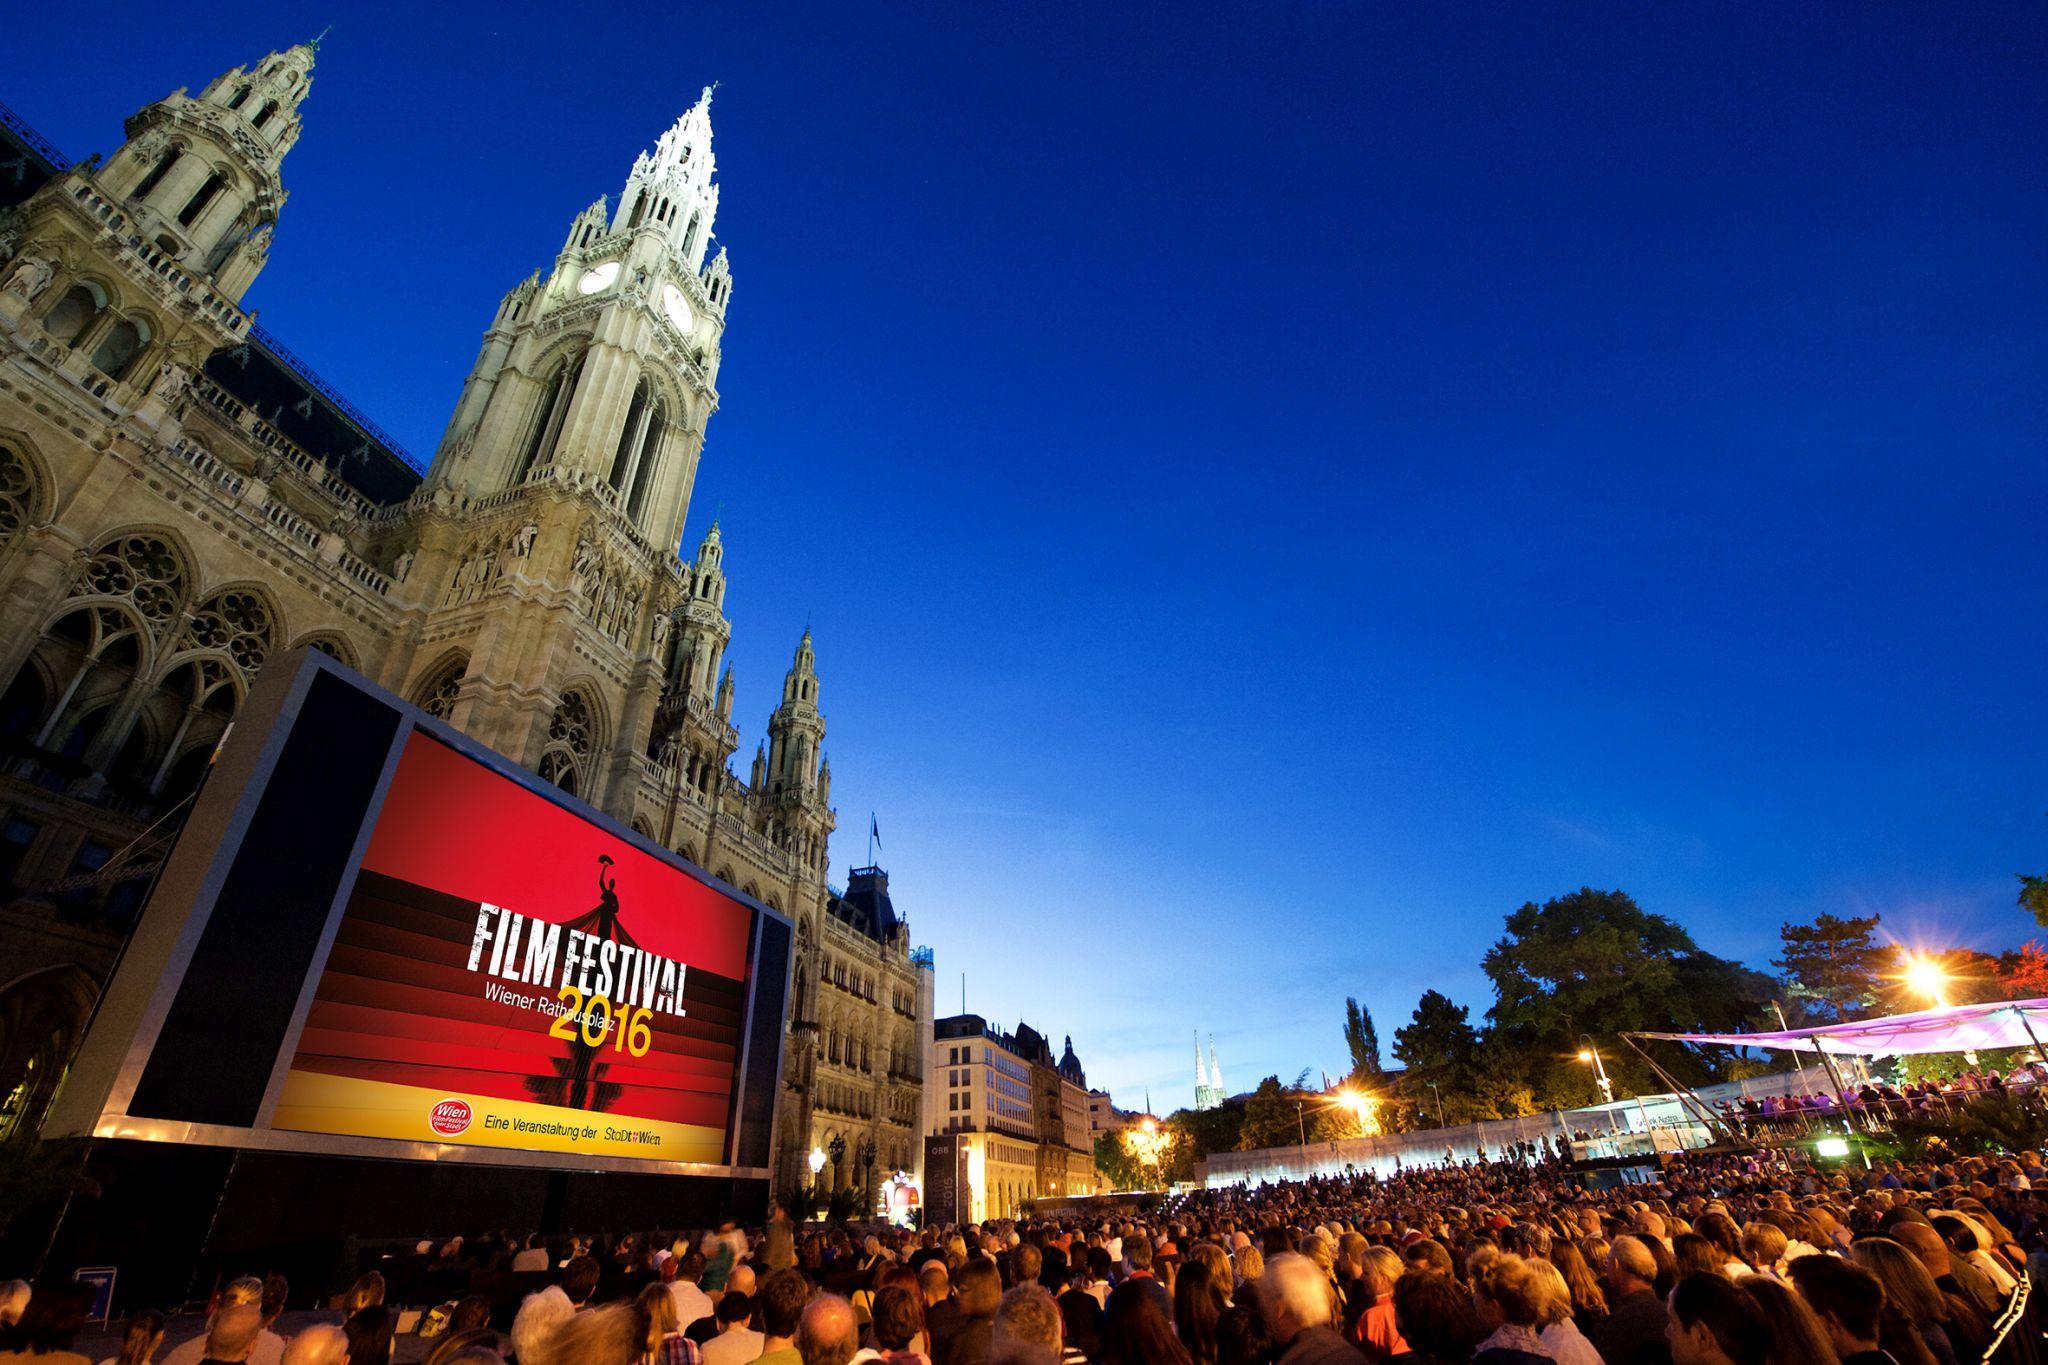 Bečki filmski festival